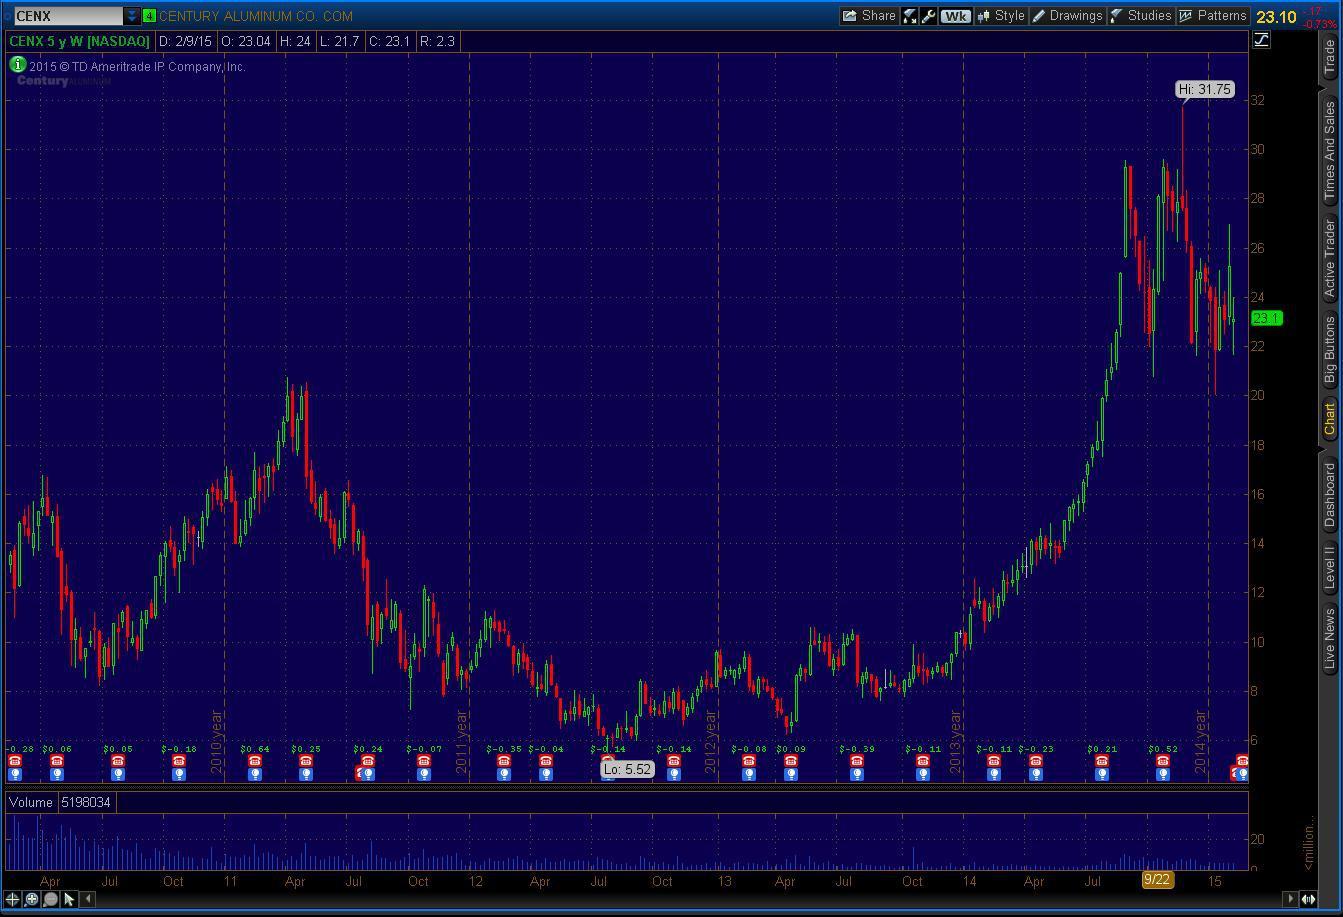 Century Aluminum Company: Promise Amidst Market Noise - Century ...